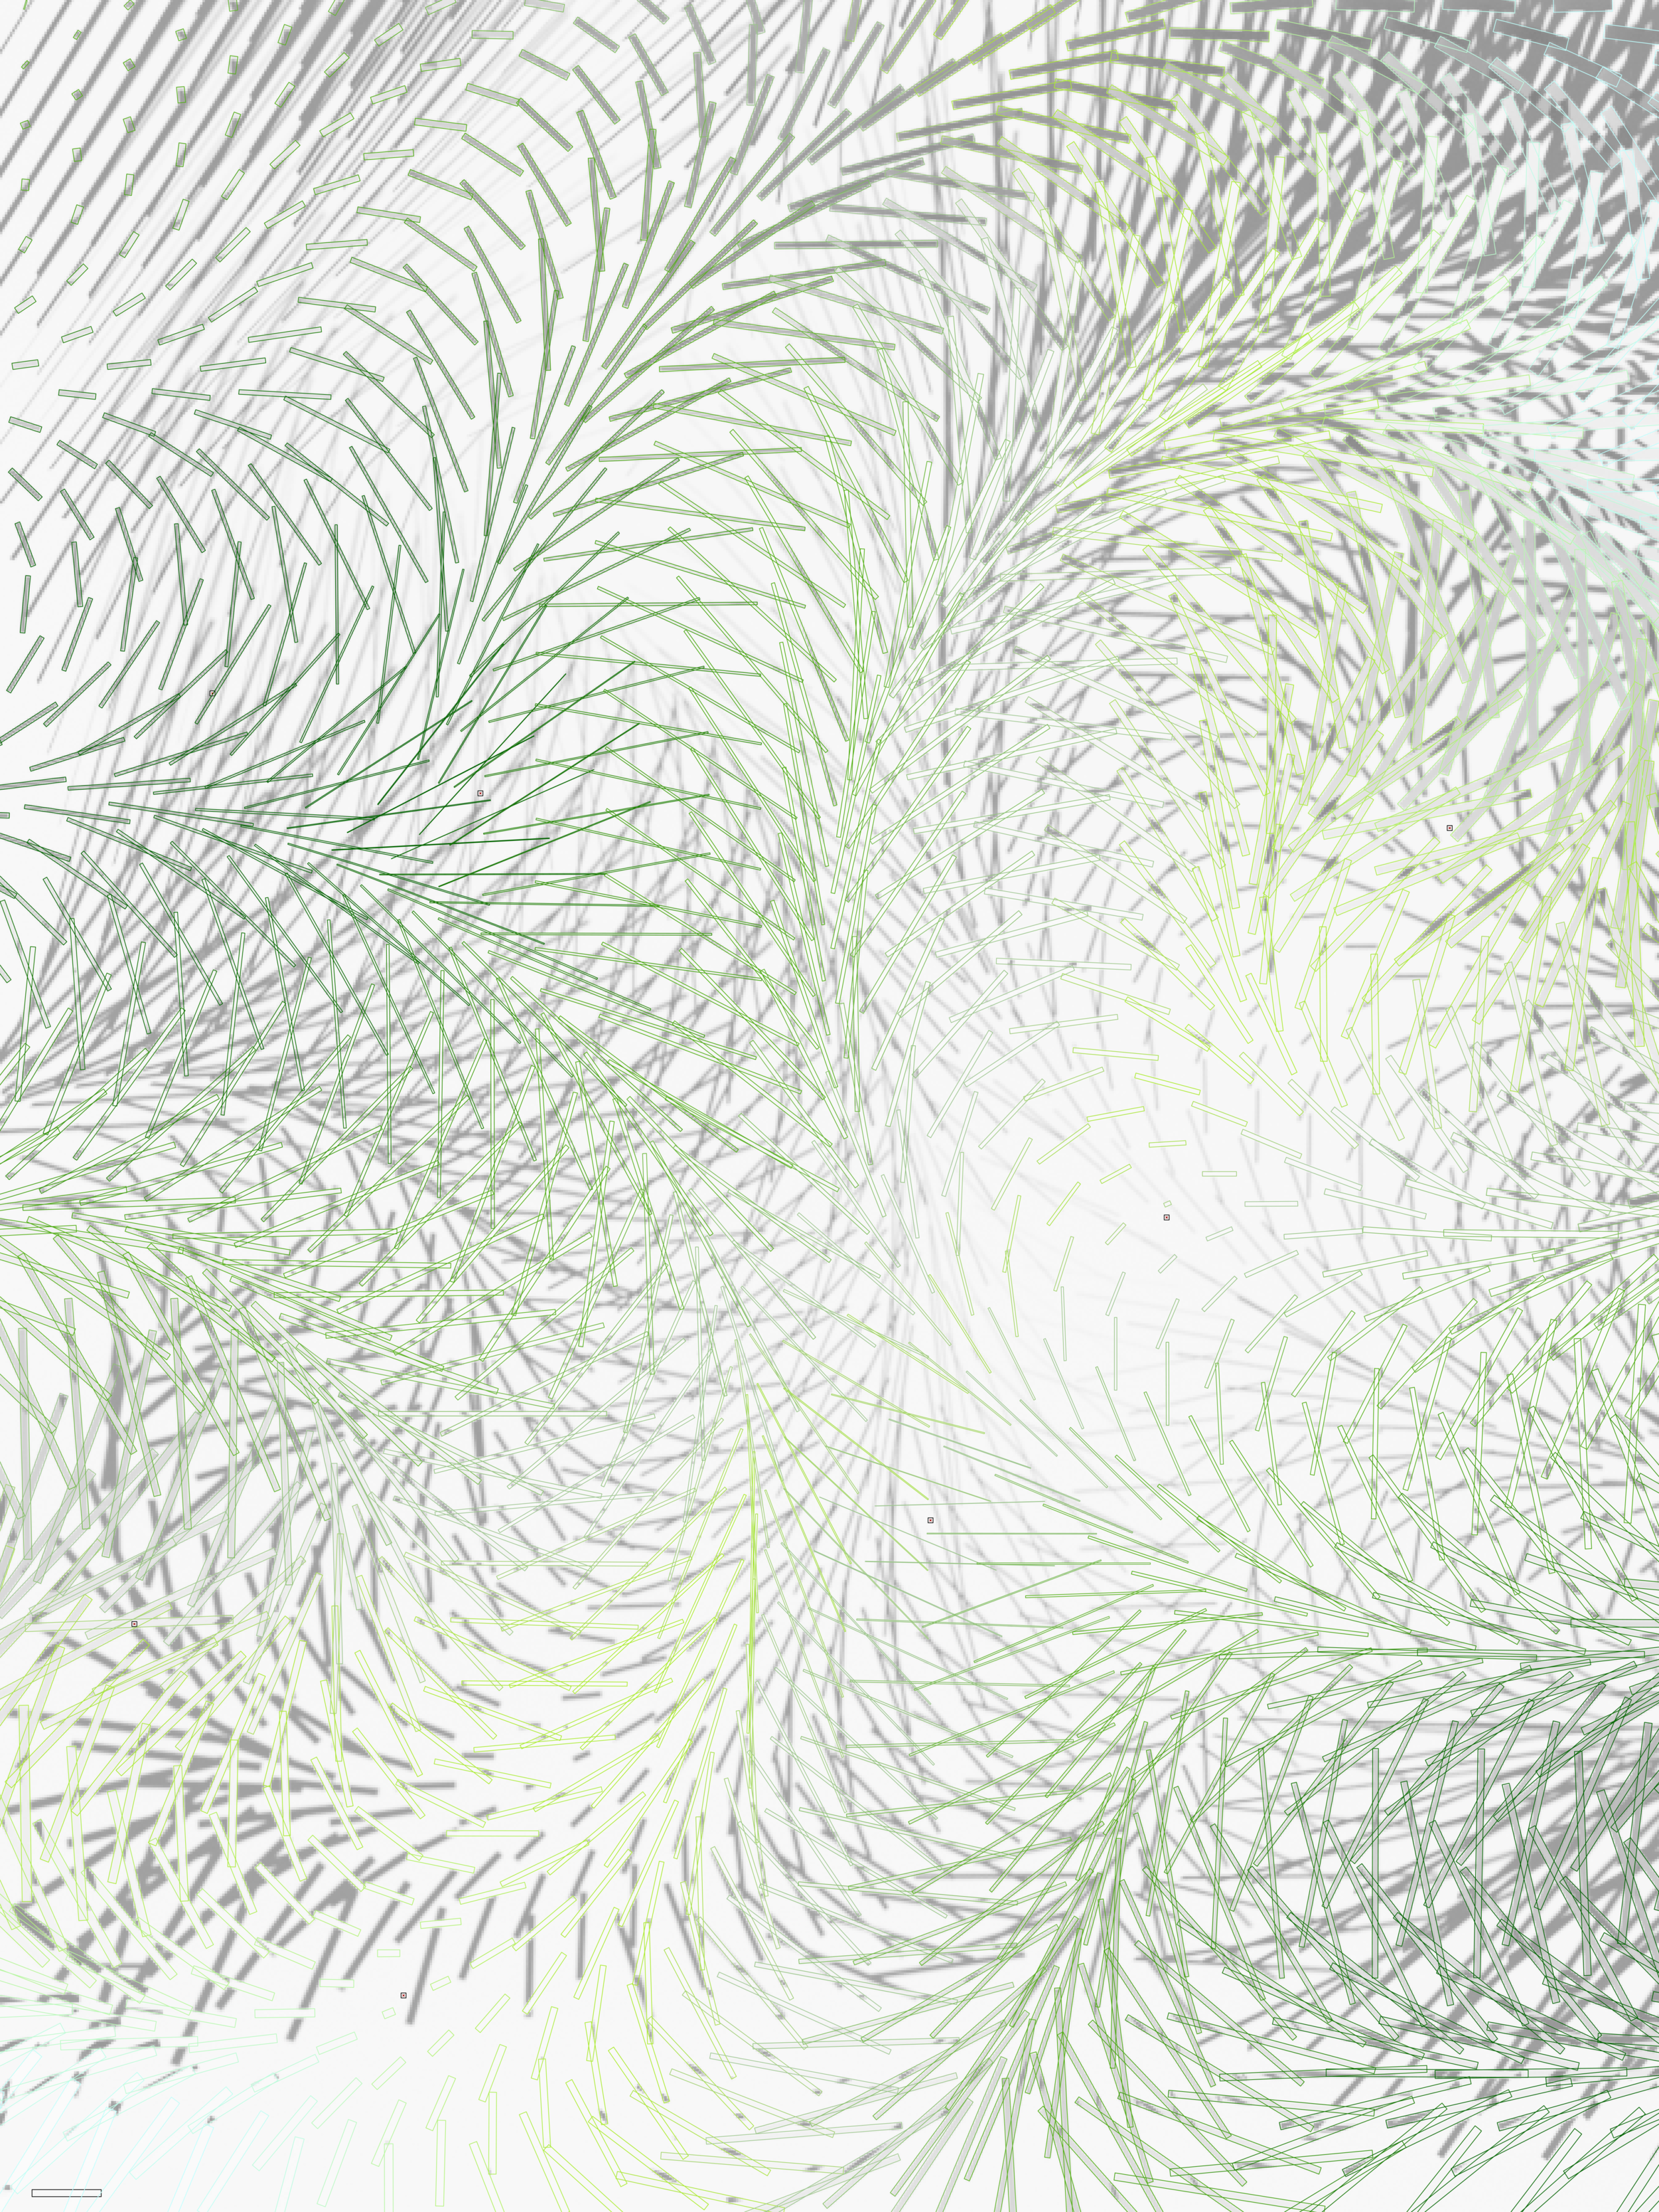 SP16_Studio_Zezhong Yu_Assignment_Atmospheric collage_original.png